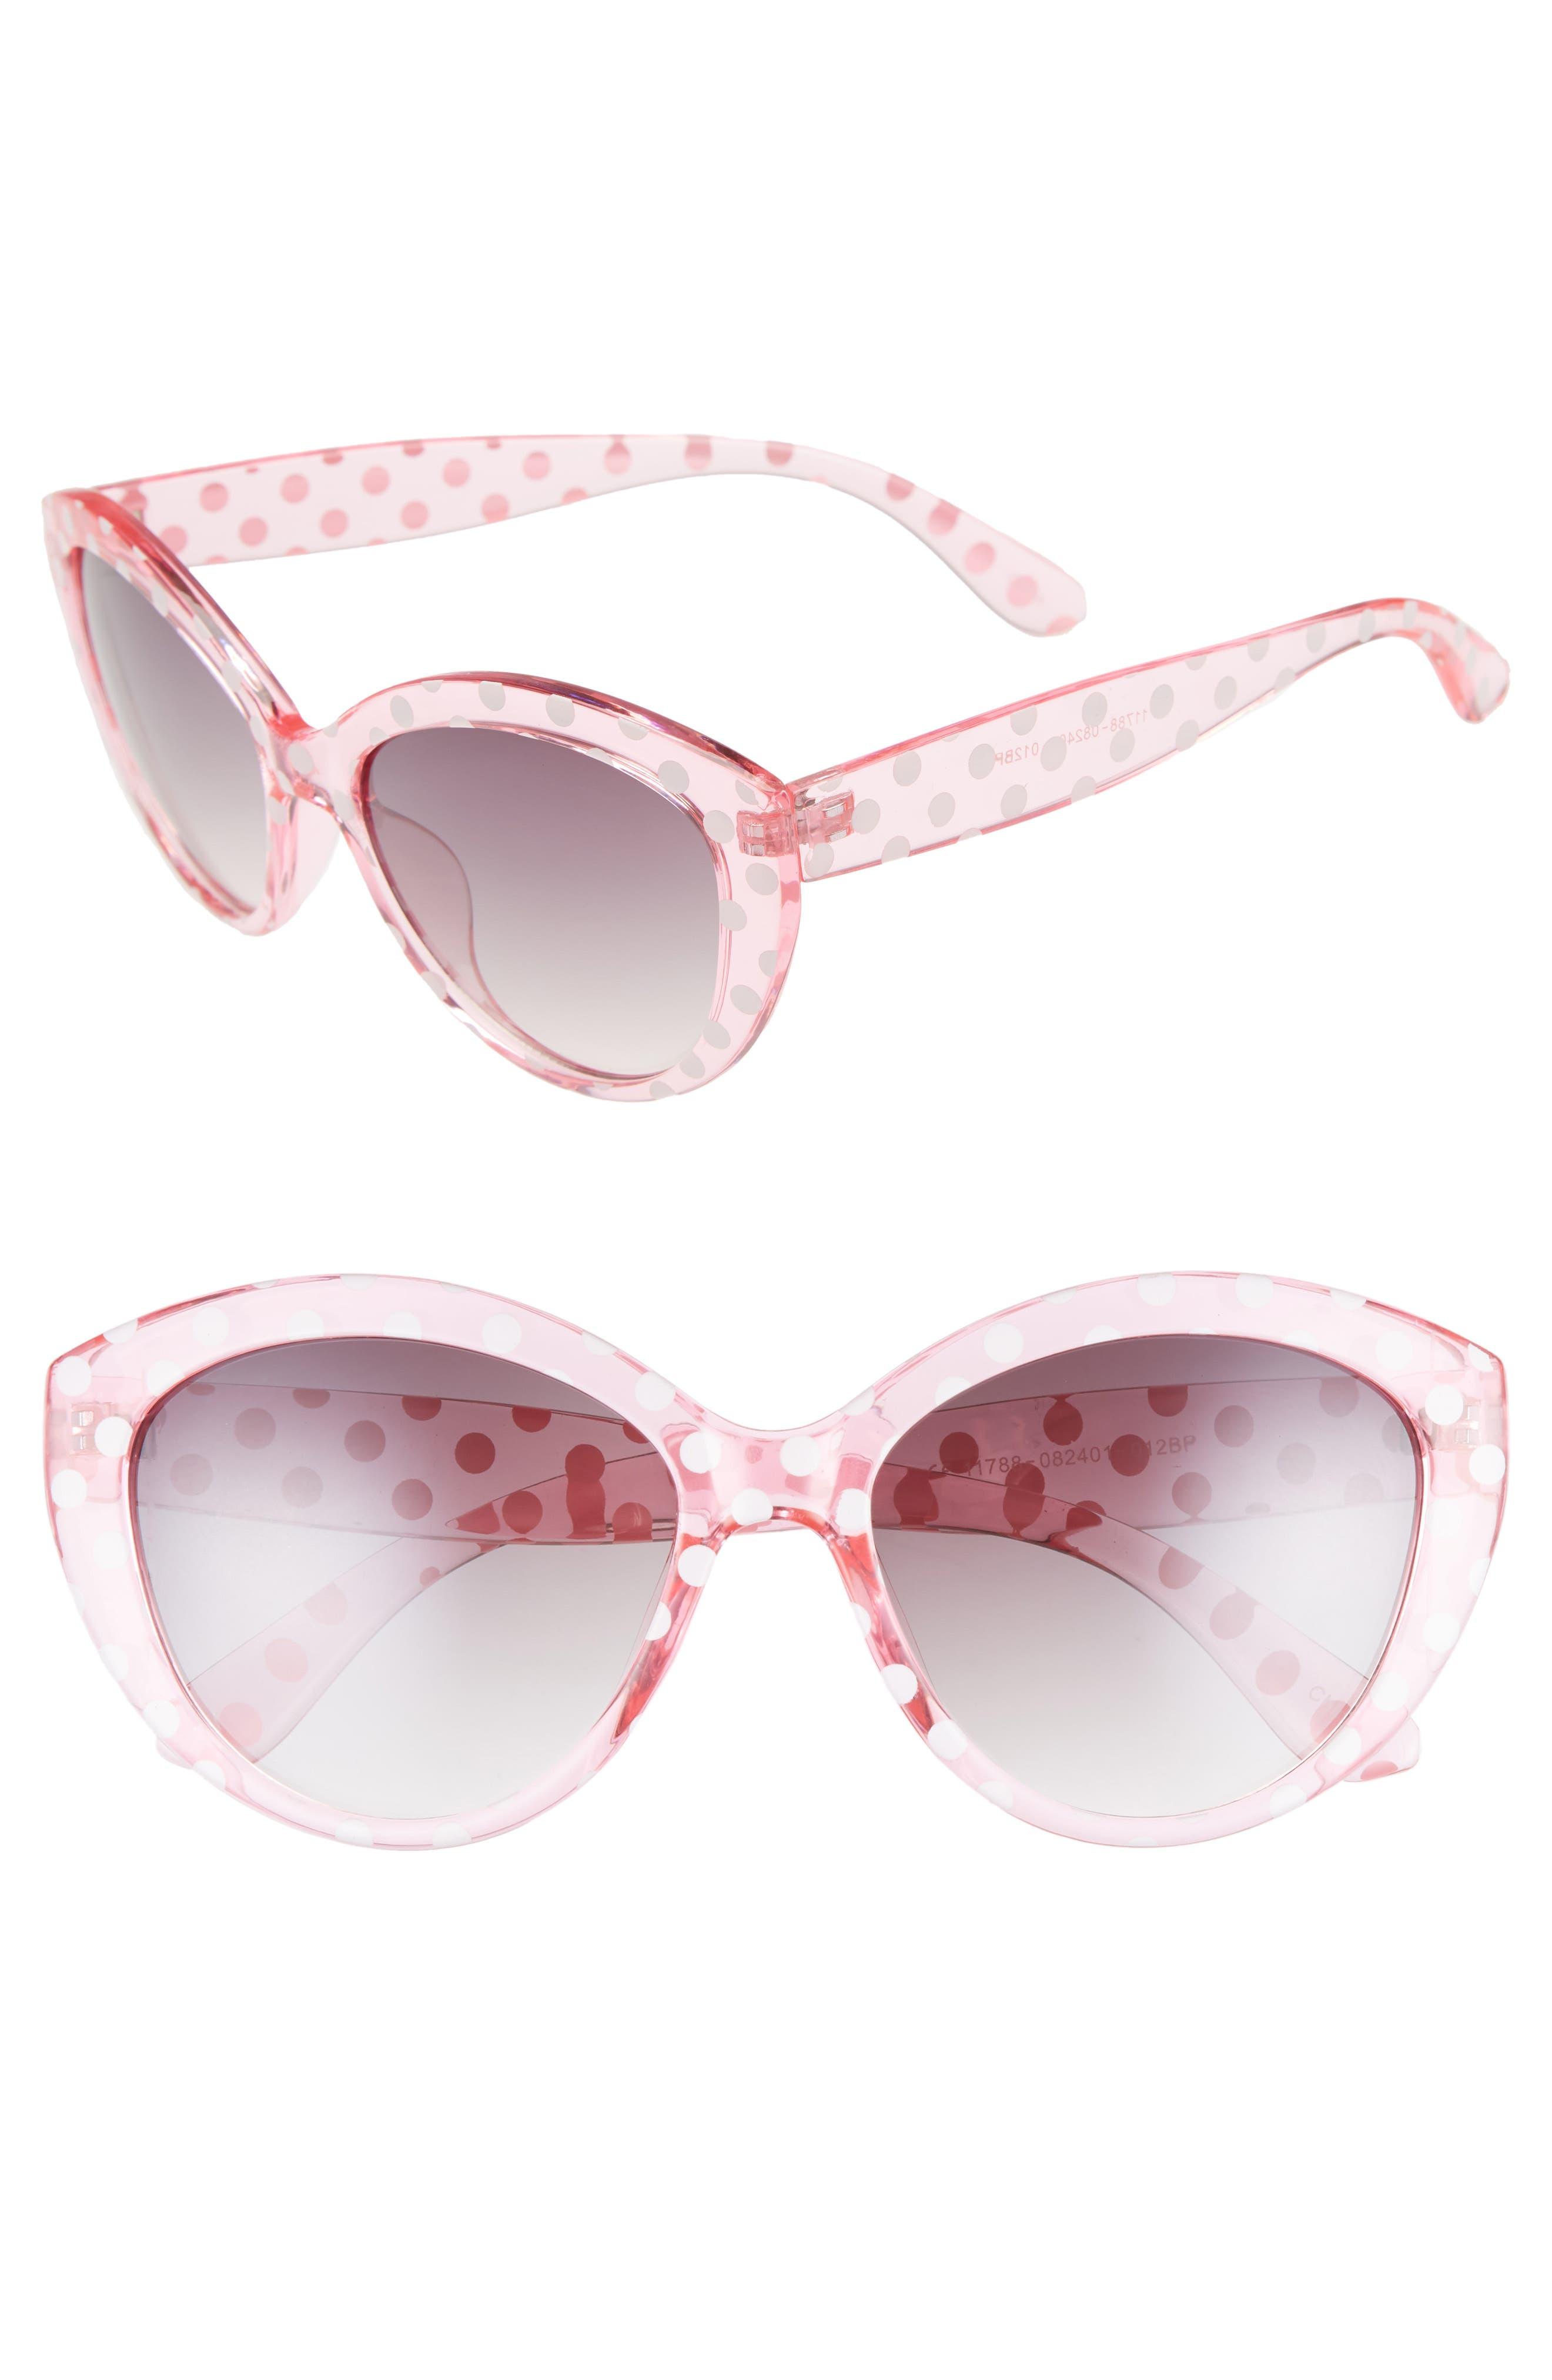 55mm Translucent Polka Dot Cat Eye Sunglasses,                             Main thumbnail 1, color,                             PINK/ BLACK